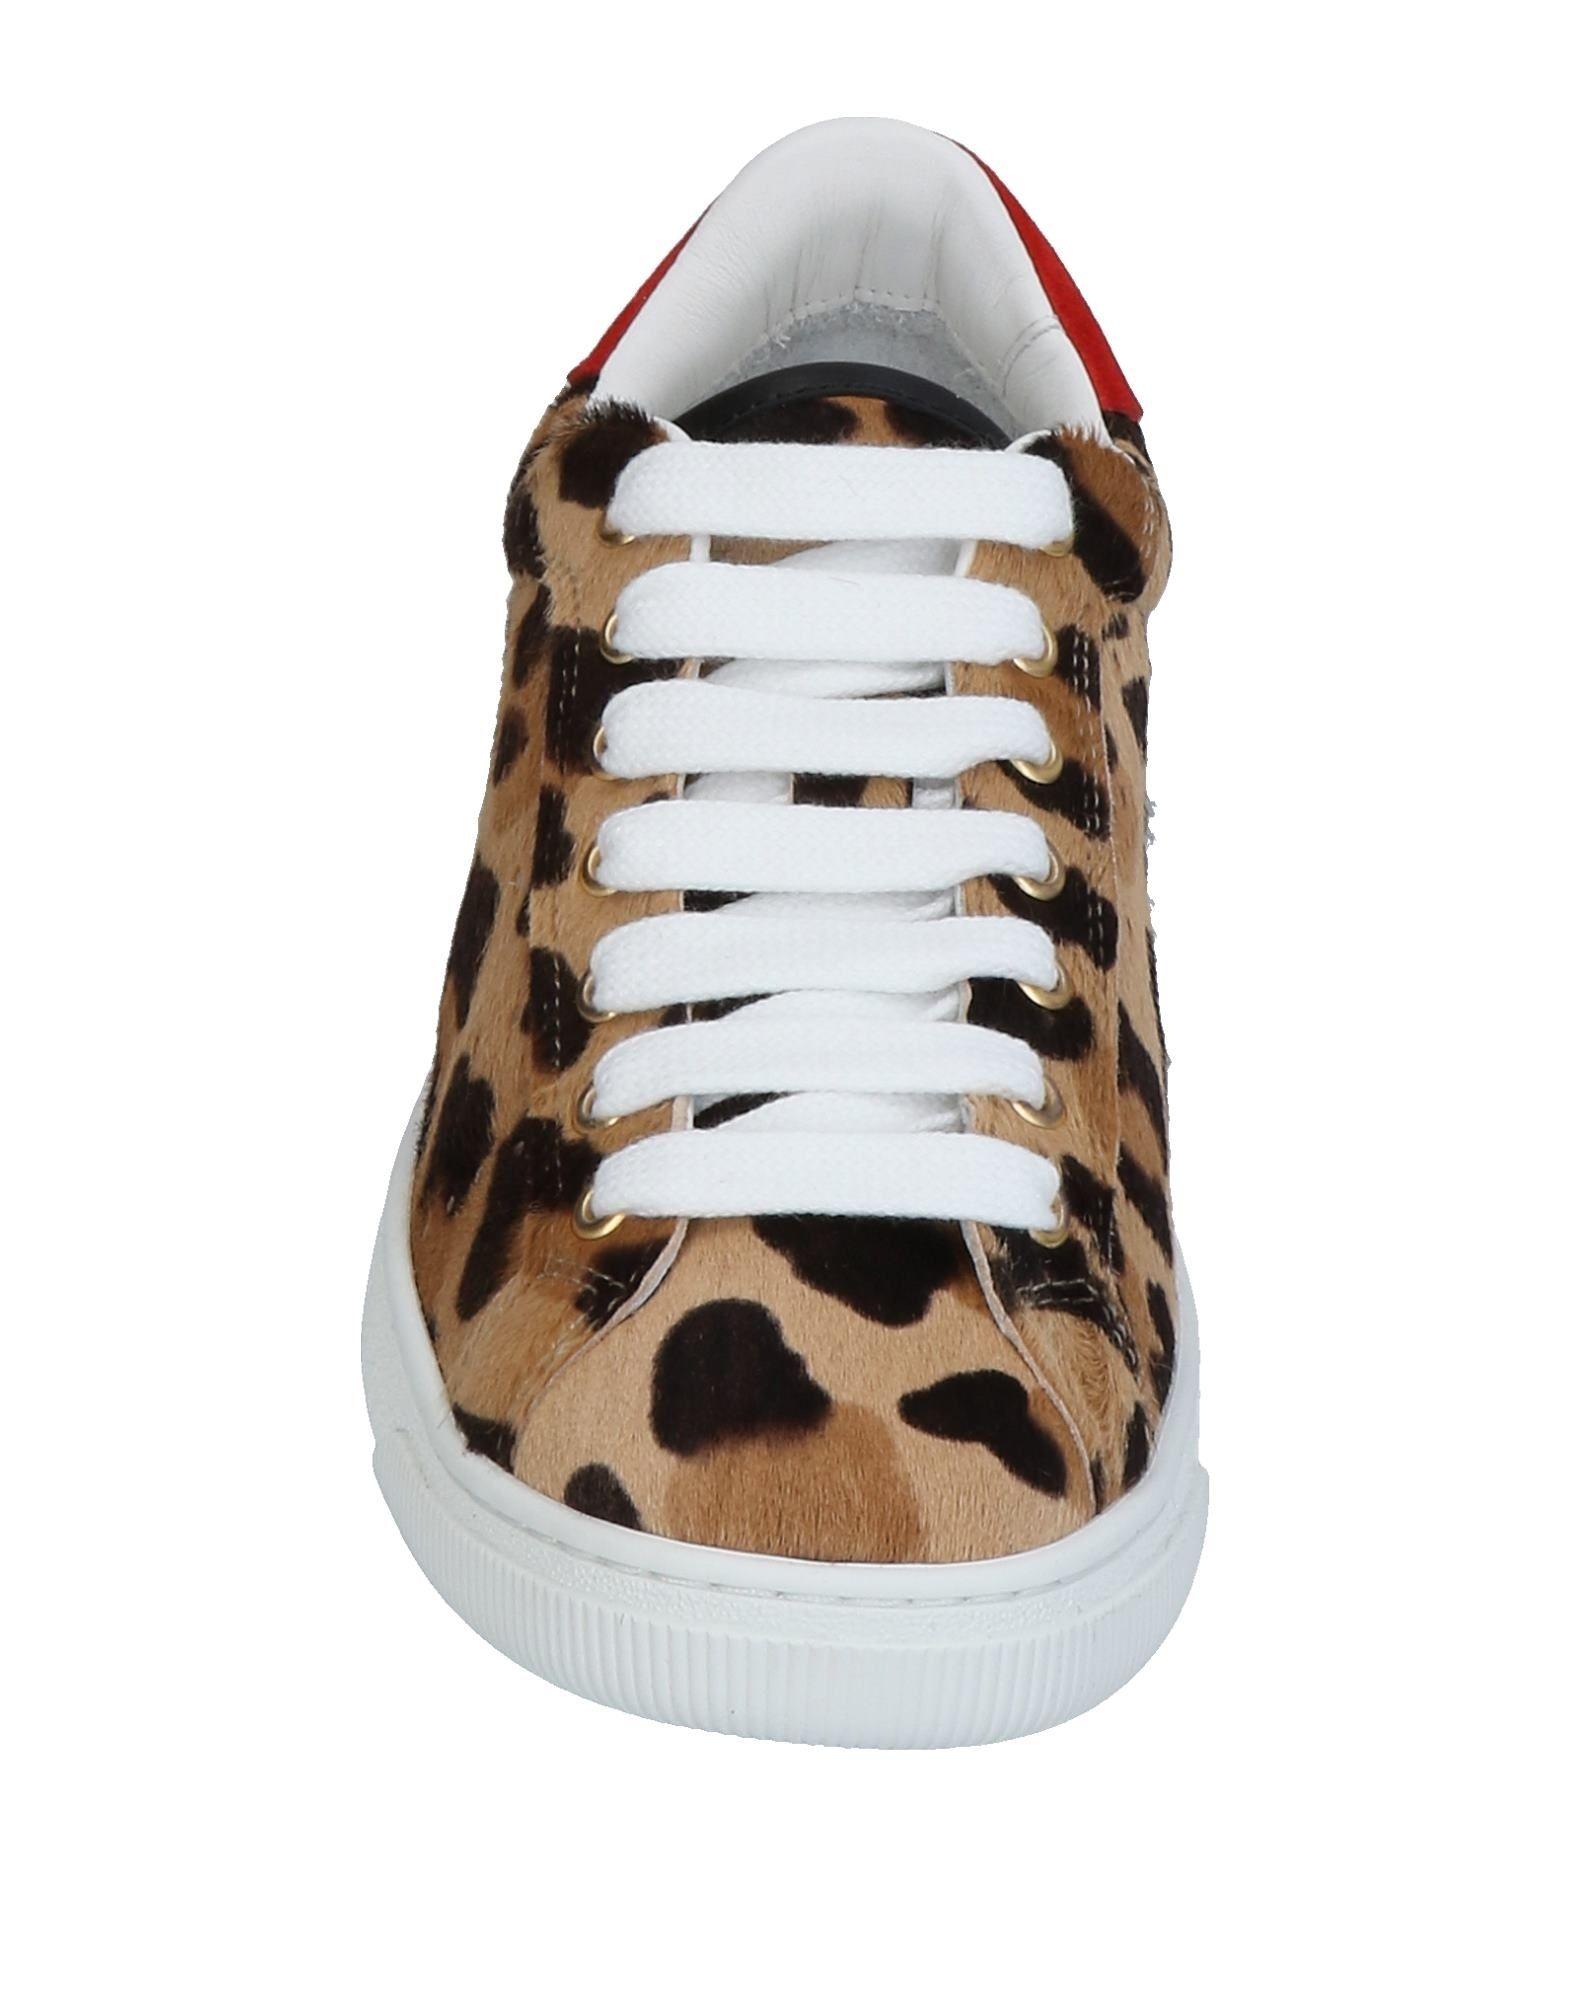 Rabatt Schuhe Dsquared2 Sneakers Damen 11459775MU  11459775MU Damen 846224